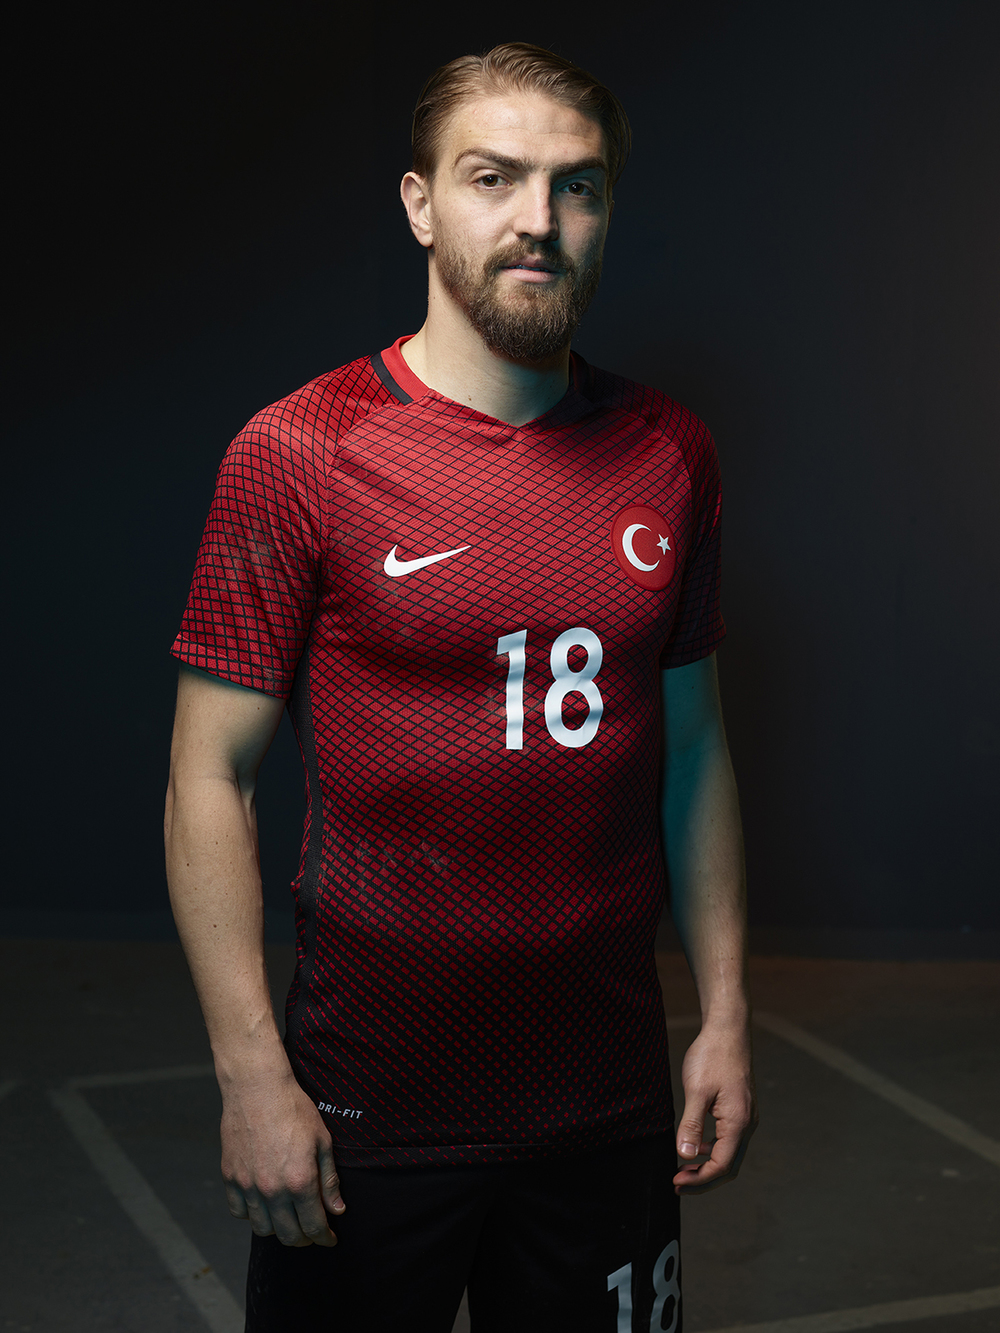 NikeTurkey_TWB_3073.jpg